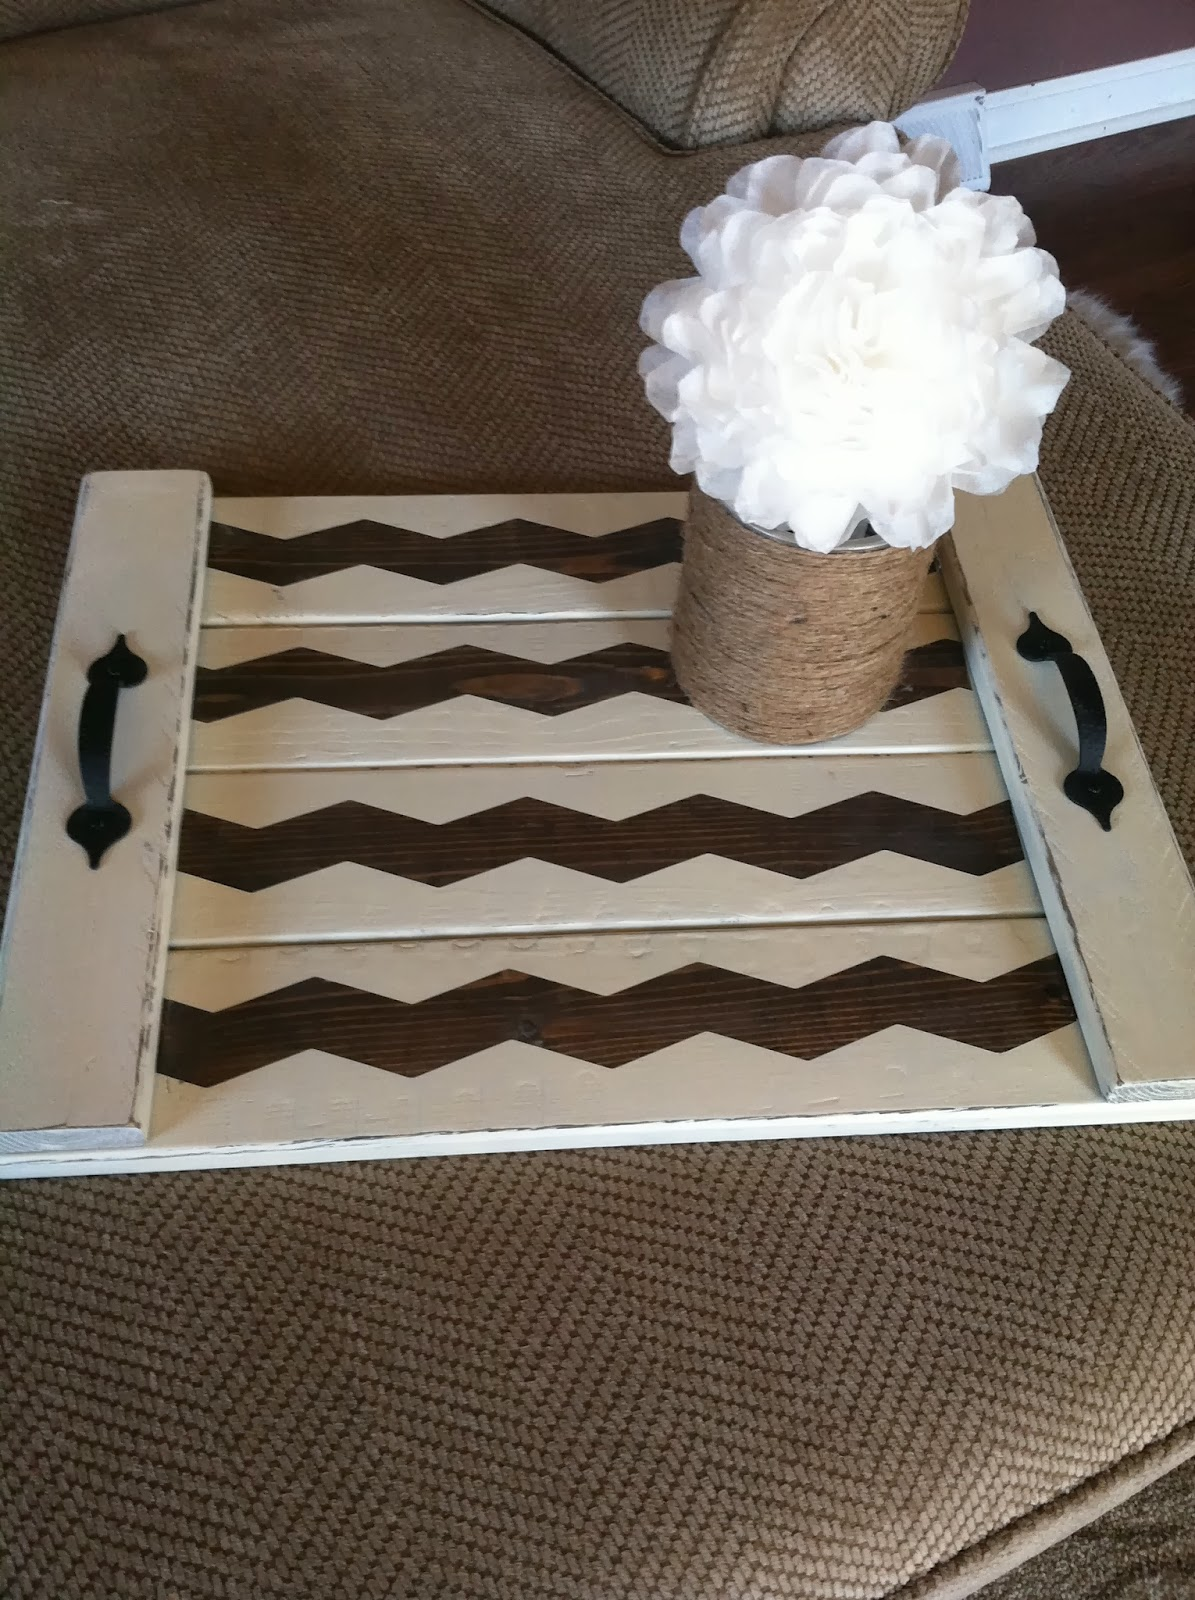 burlap and bananas shabby chic chevron diy wood tray. Black Bedroom Furniture Sets. Home Design Ideas